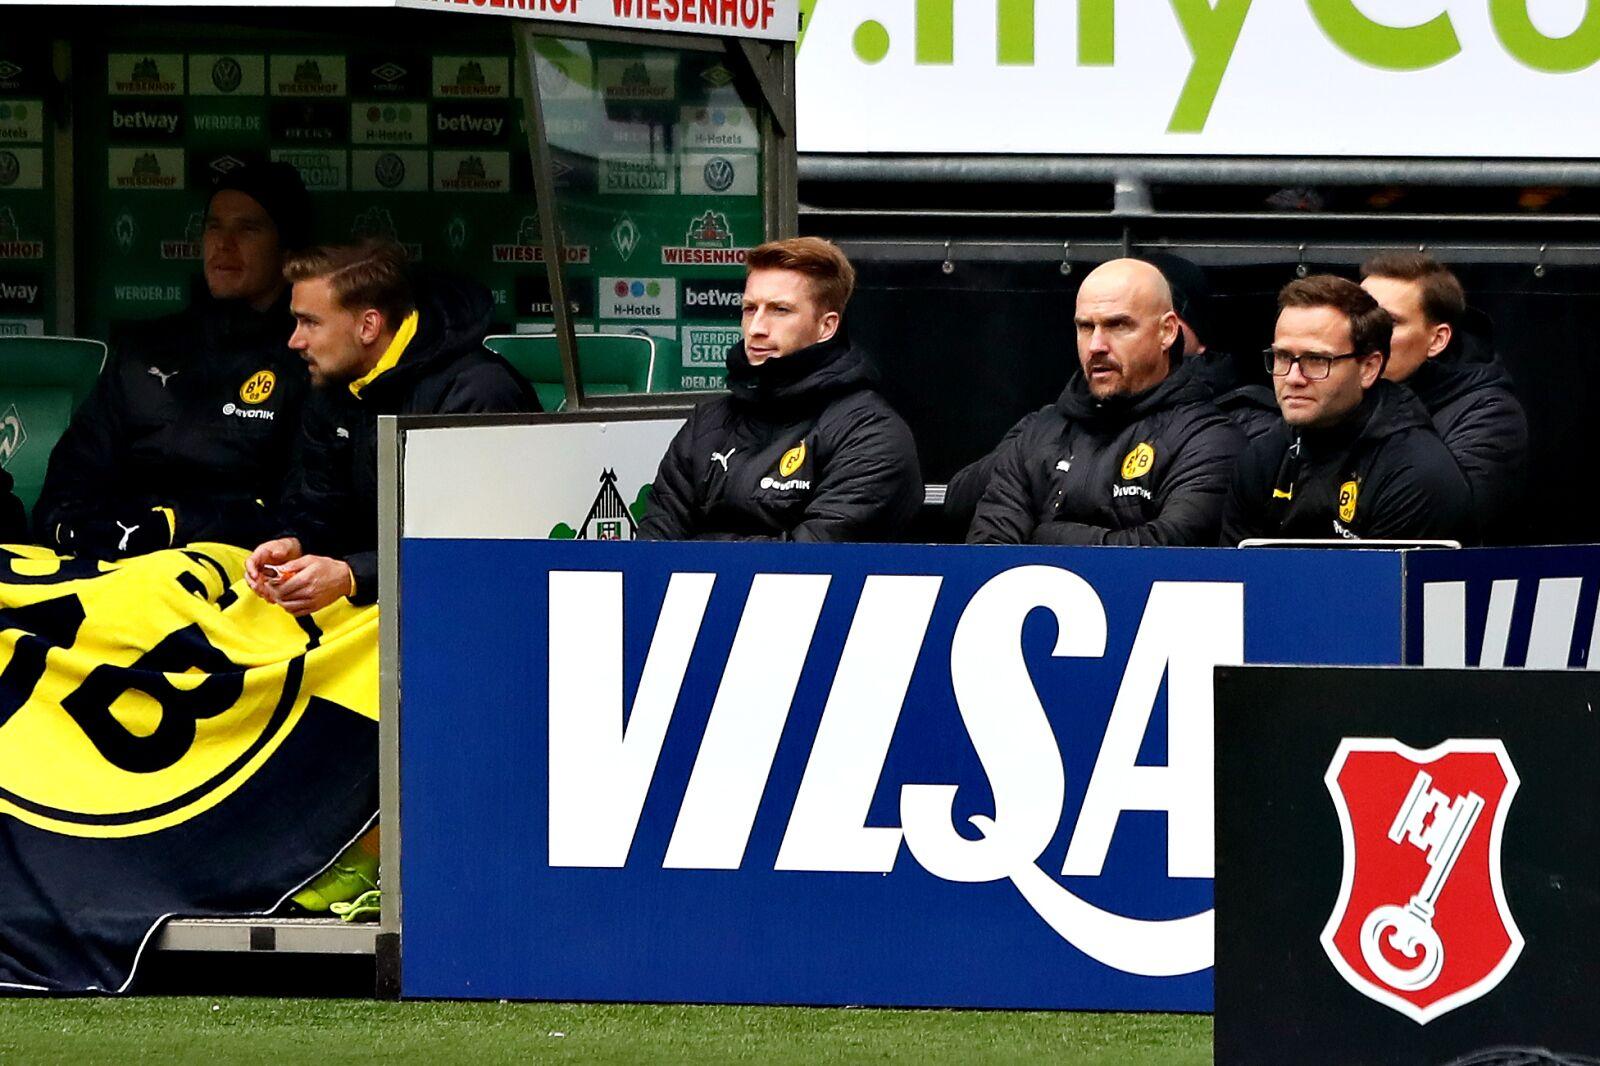 Borussia Dortmund News Roundup: Reus fined, Gotze set for new contract, Isak talks BVB future